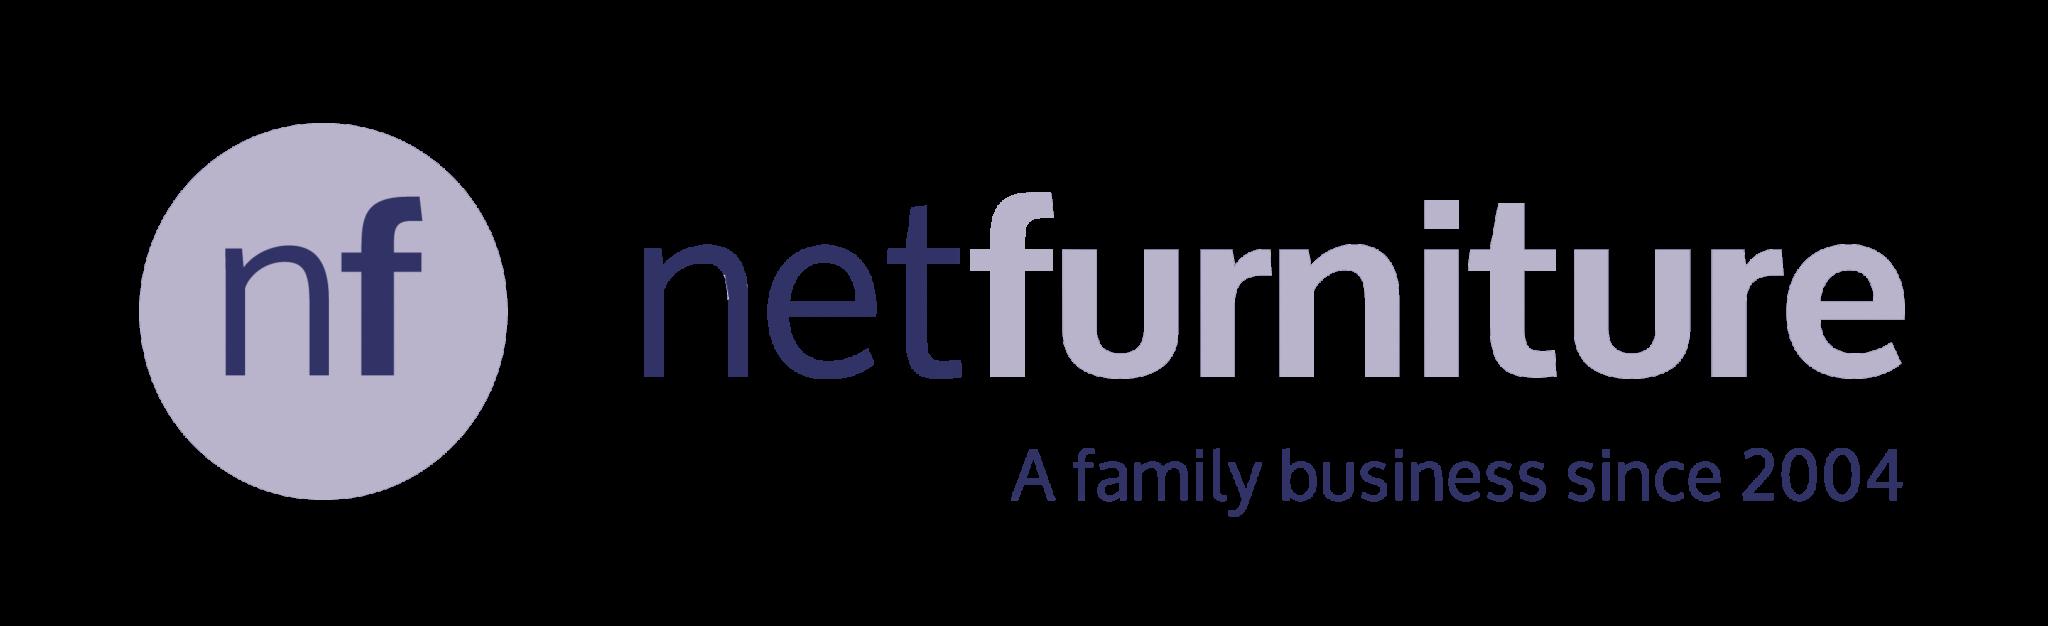 Netfurniture Discount Code